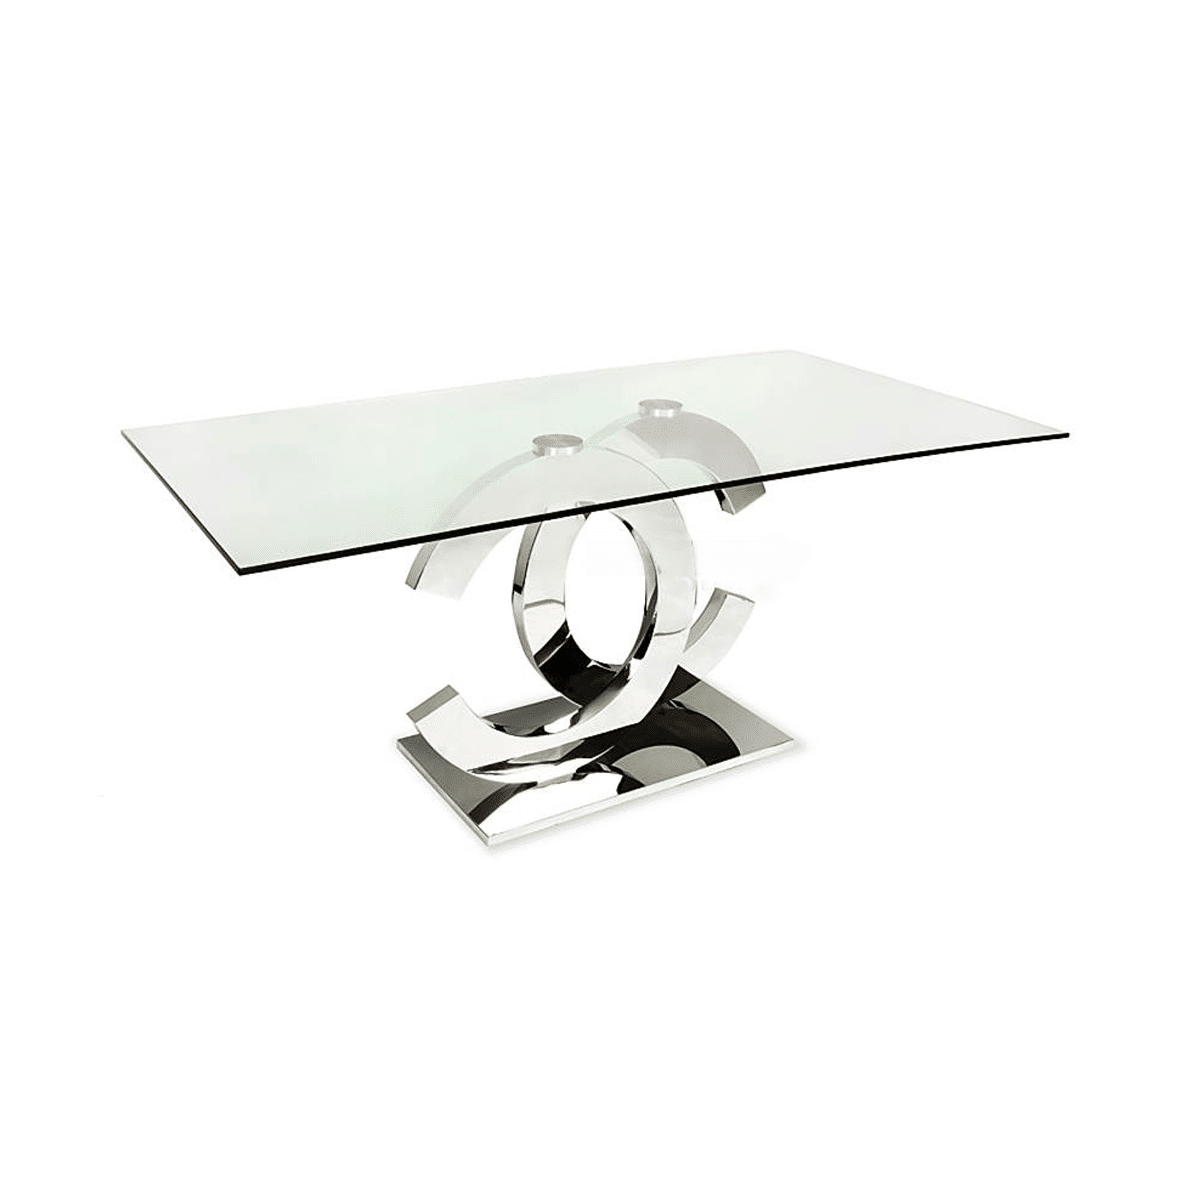 Chanel Dining Table Modern Sense Furniture